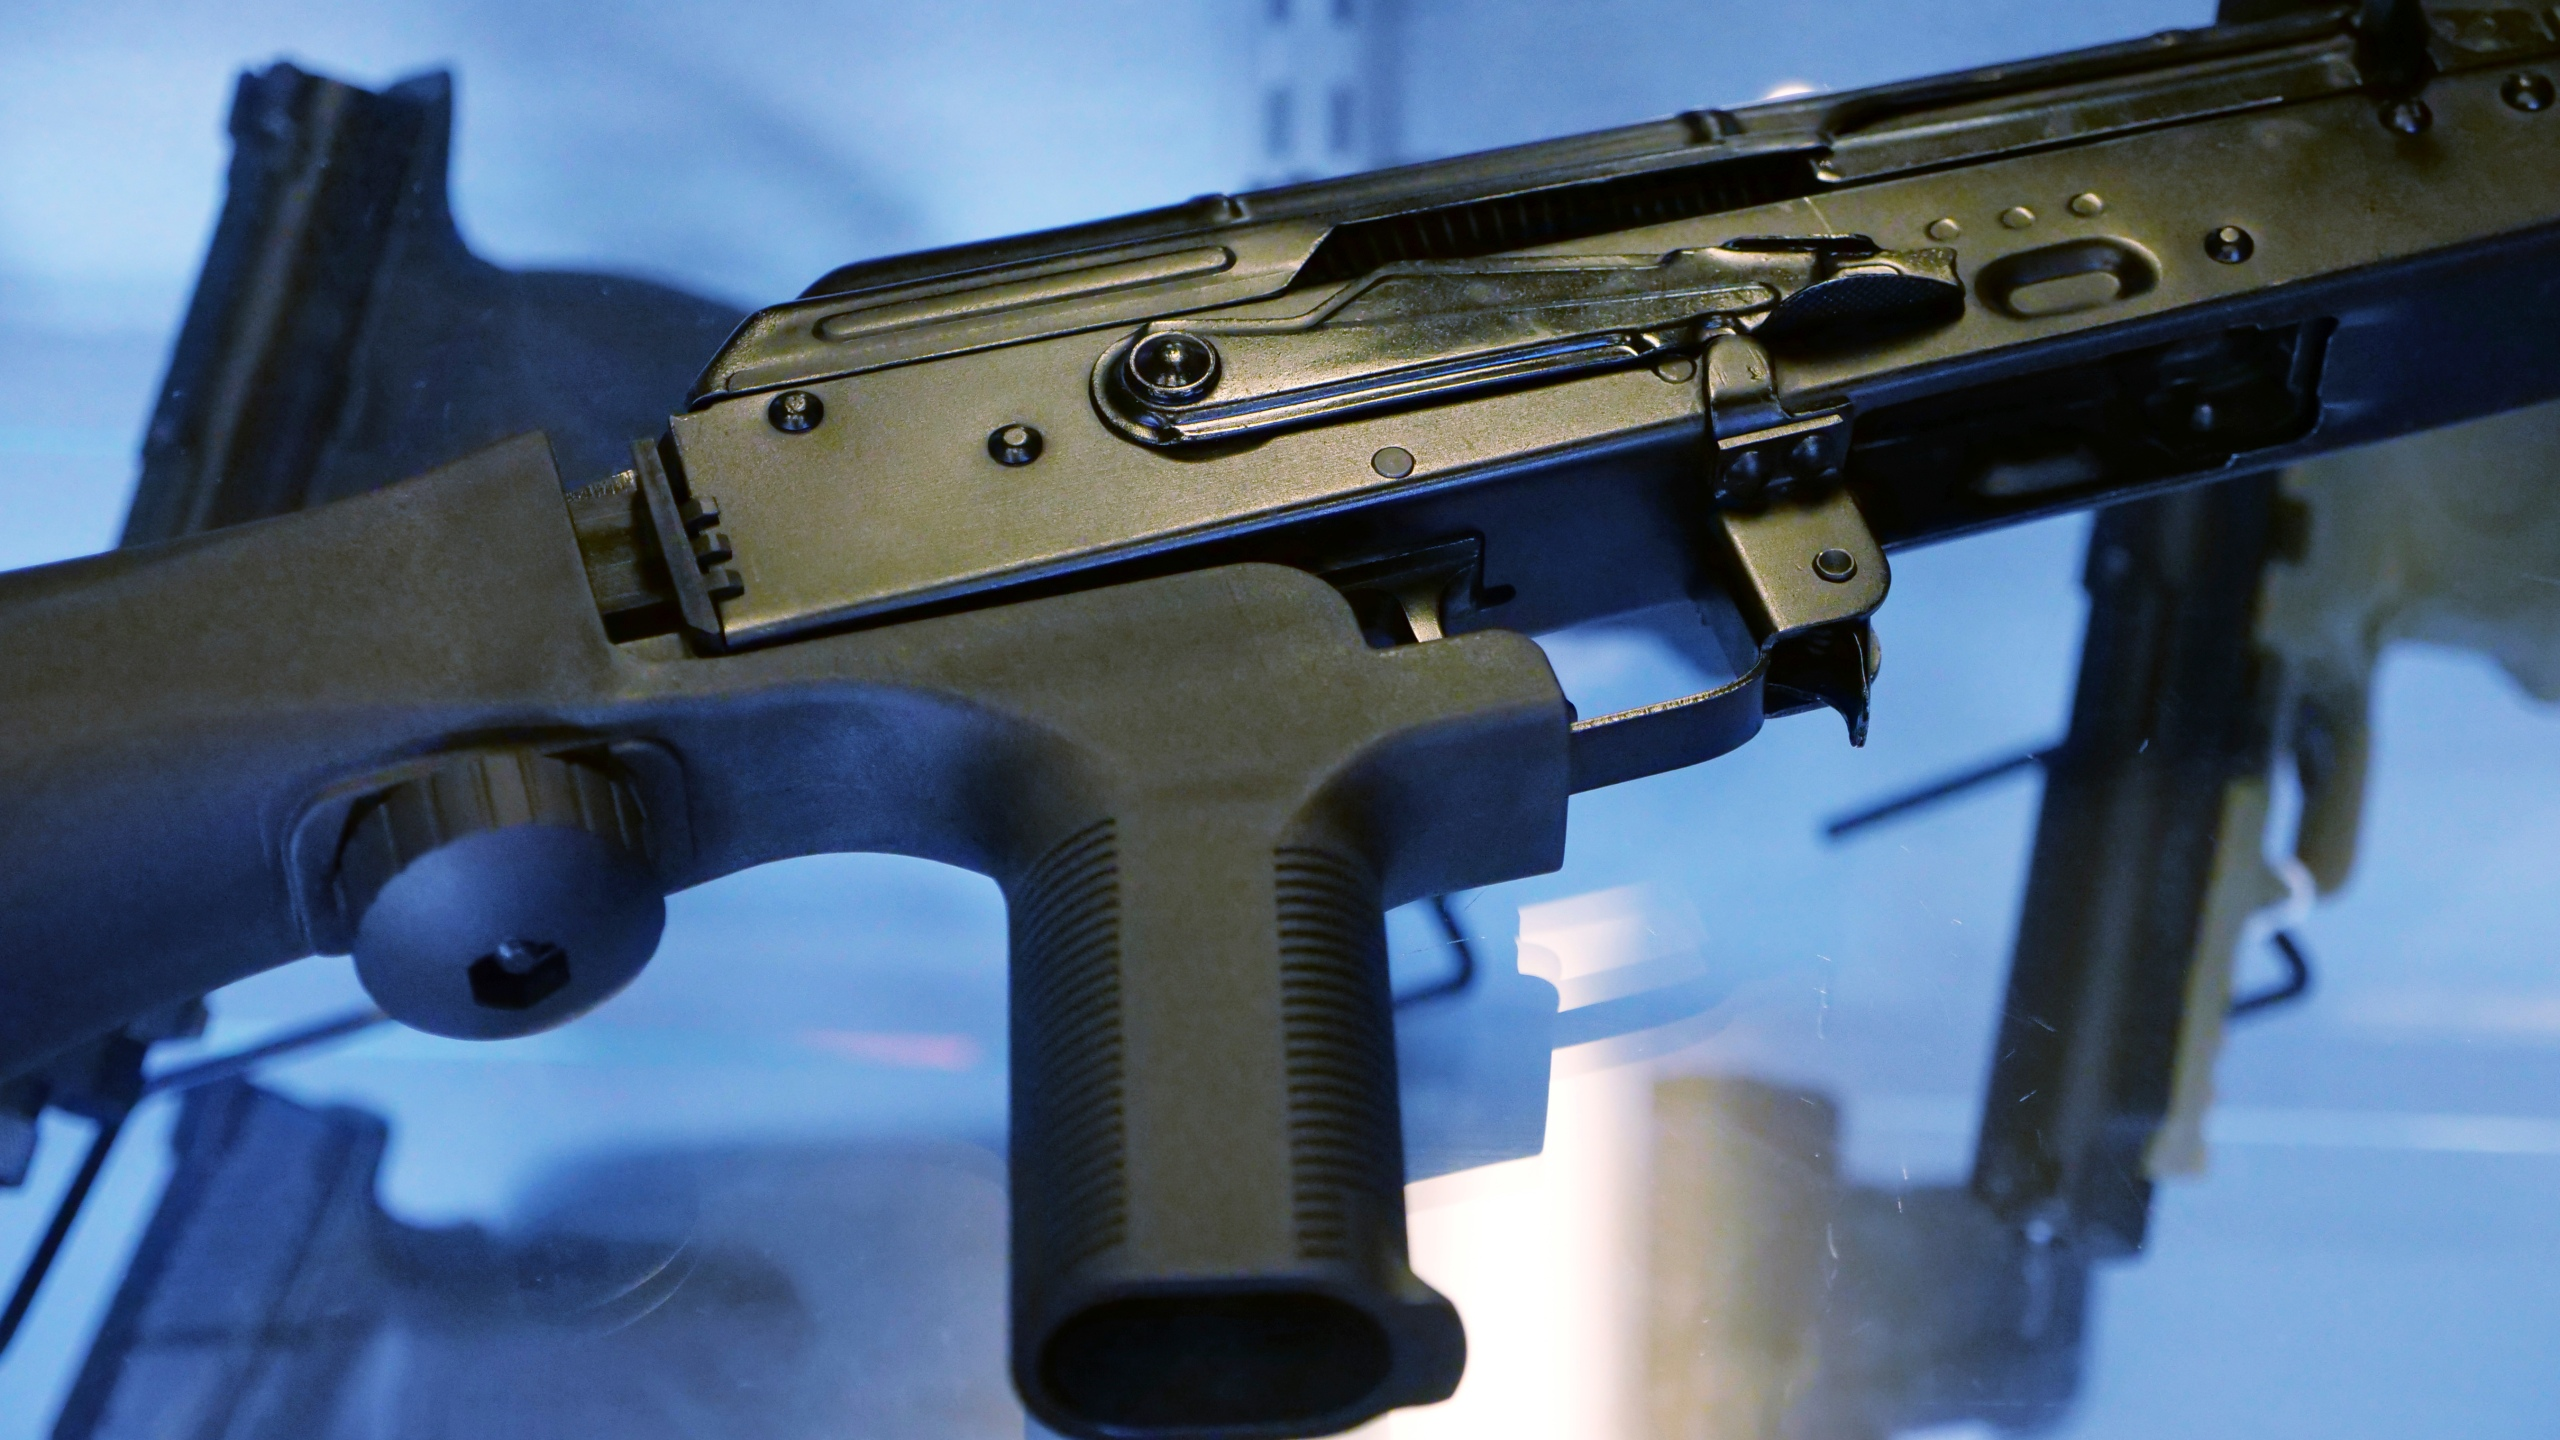 Guns_Bump_Stocks_89271-159532.jpg49113682